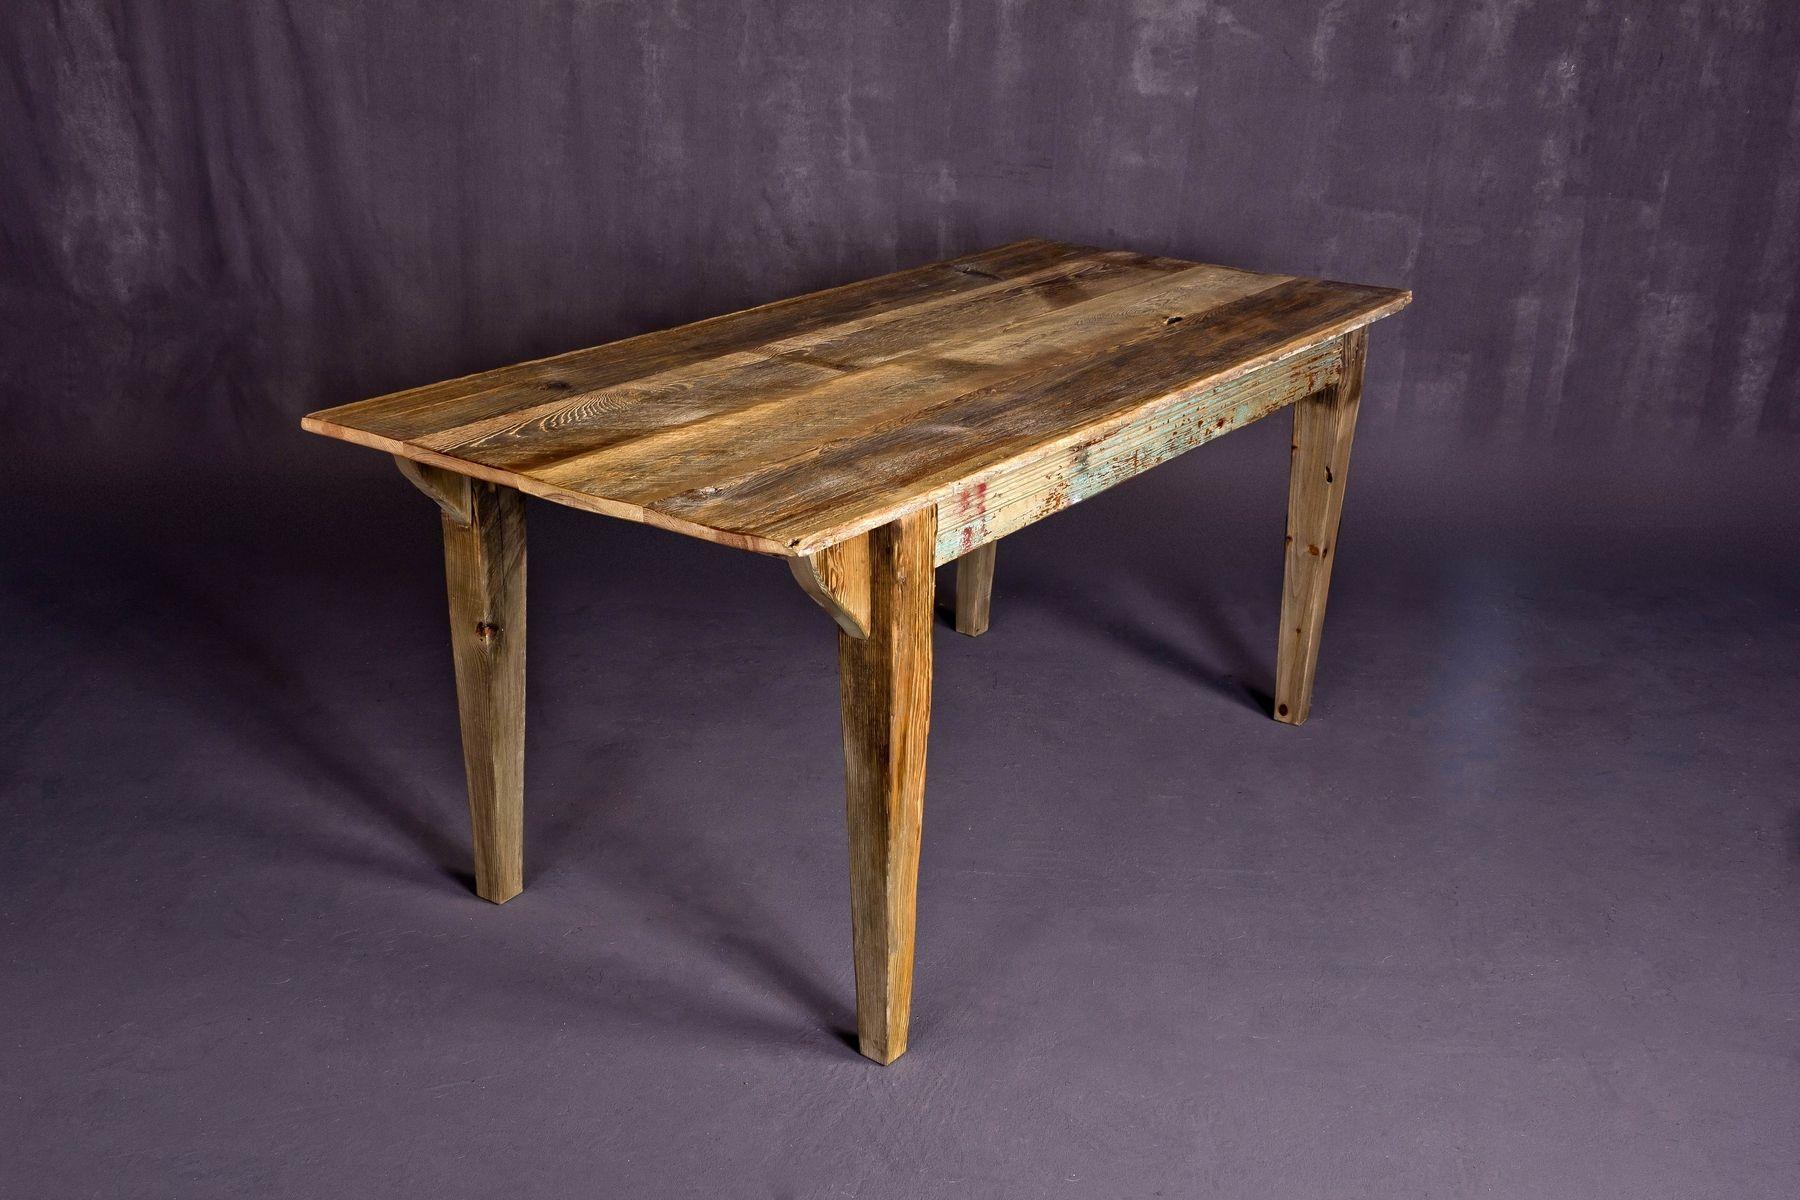 Custom Reclaimed Barn Wood Dining Table By Heirloom, LLC